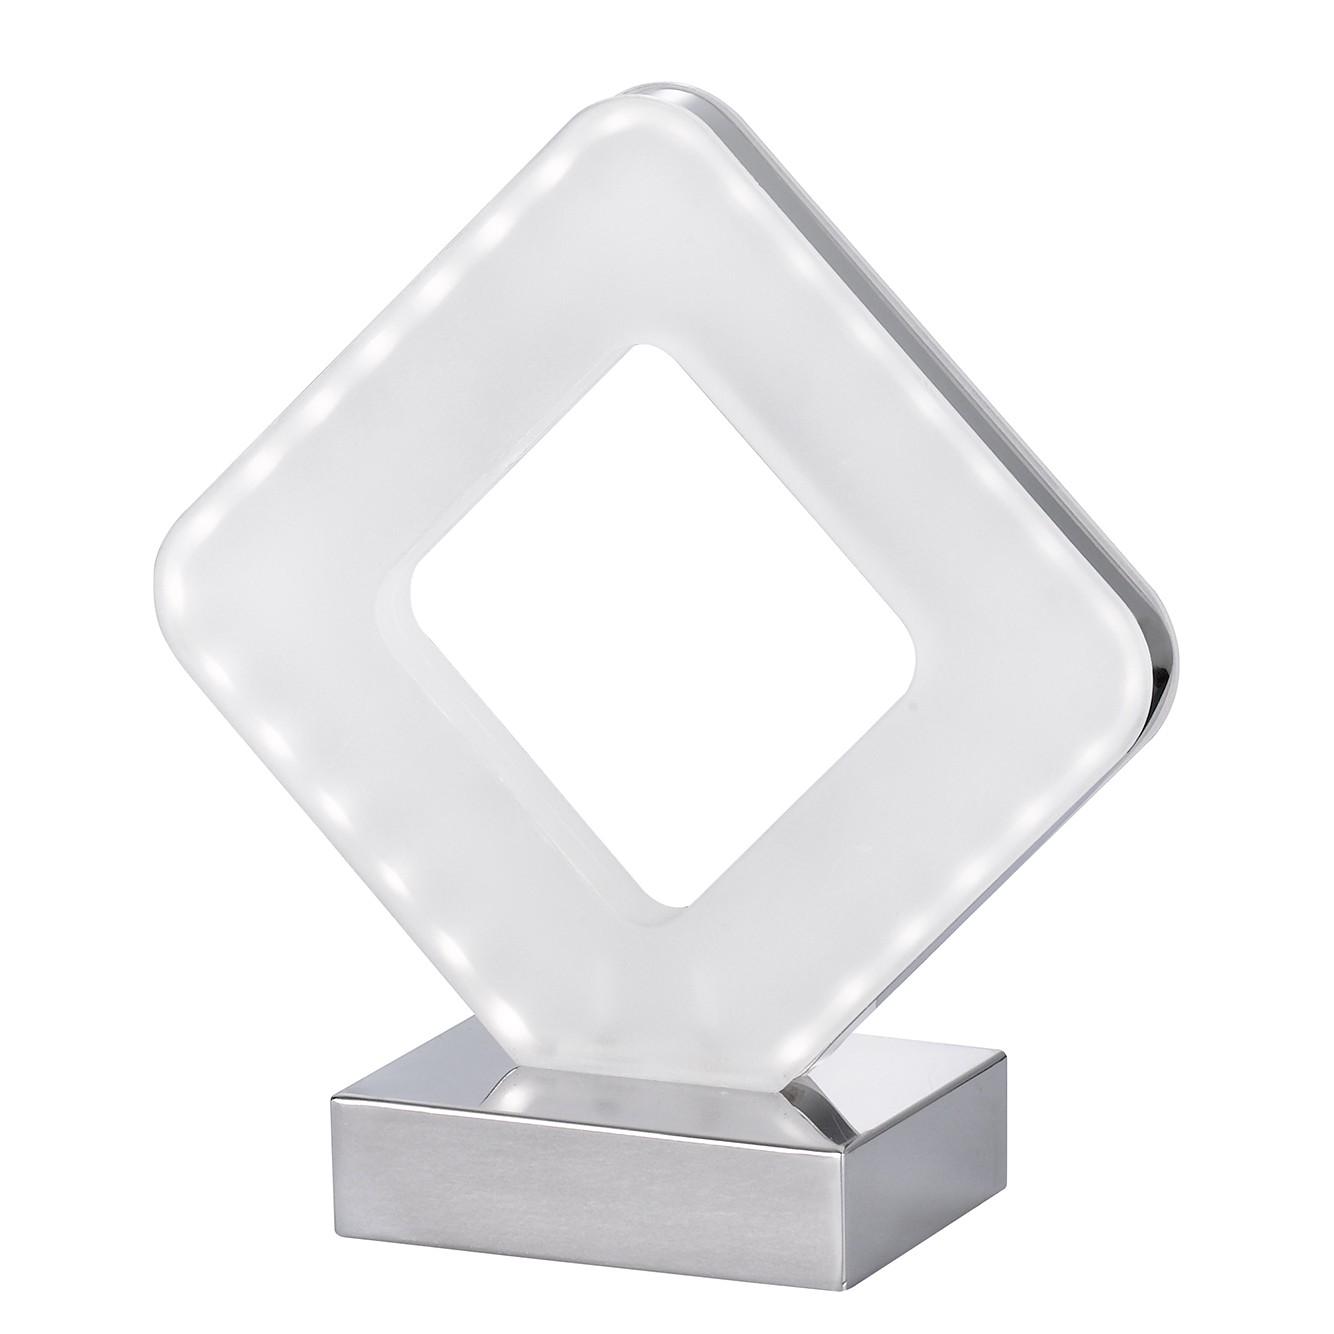 LED-Tischleuchte Kazuno